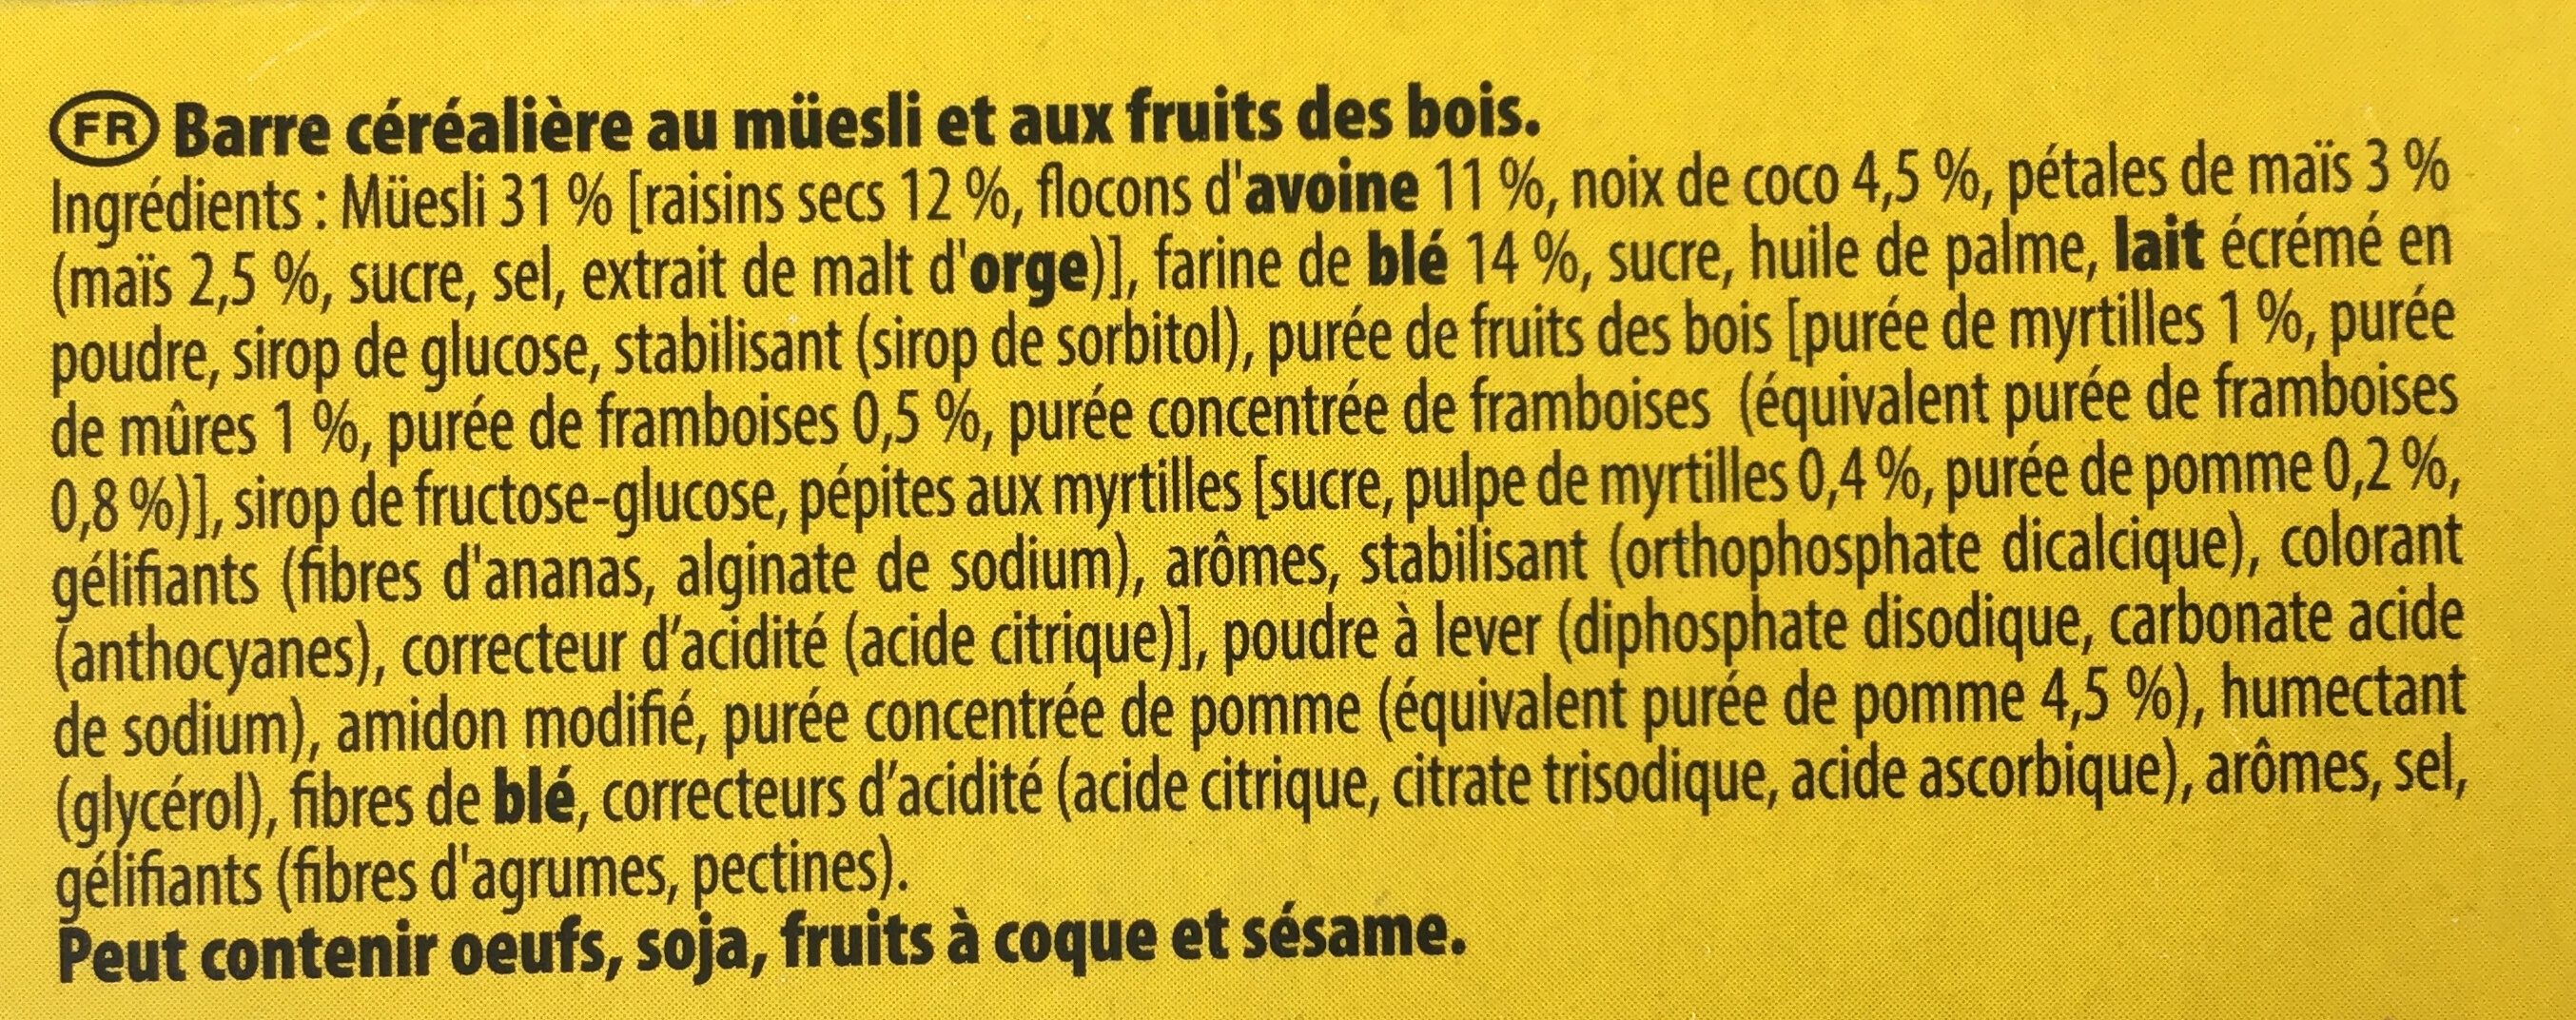 Grany, moelleux, fruit des bois, riche en fruits - Ingrediënten